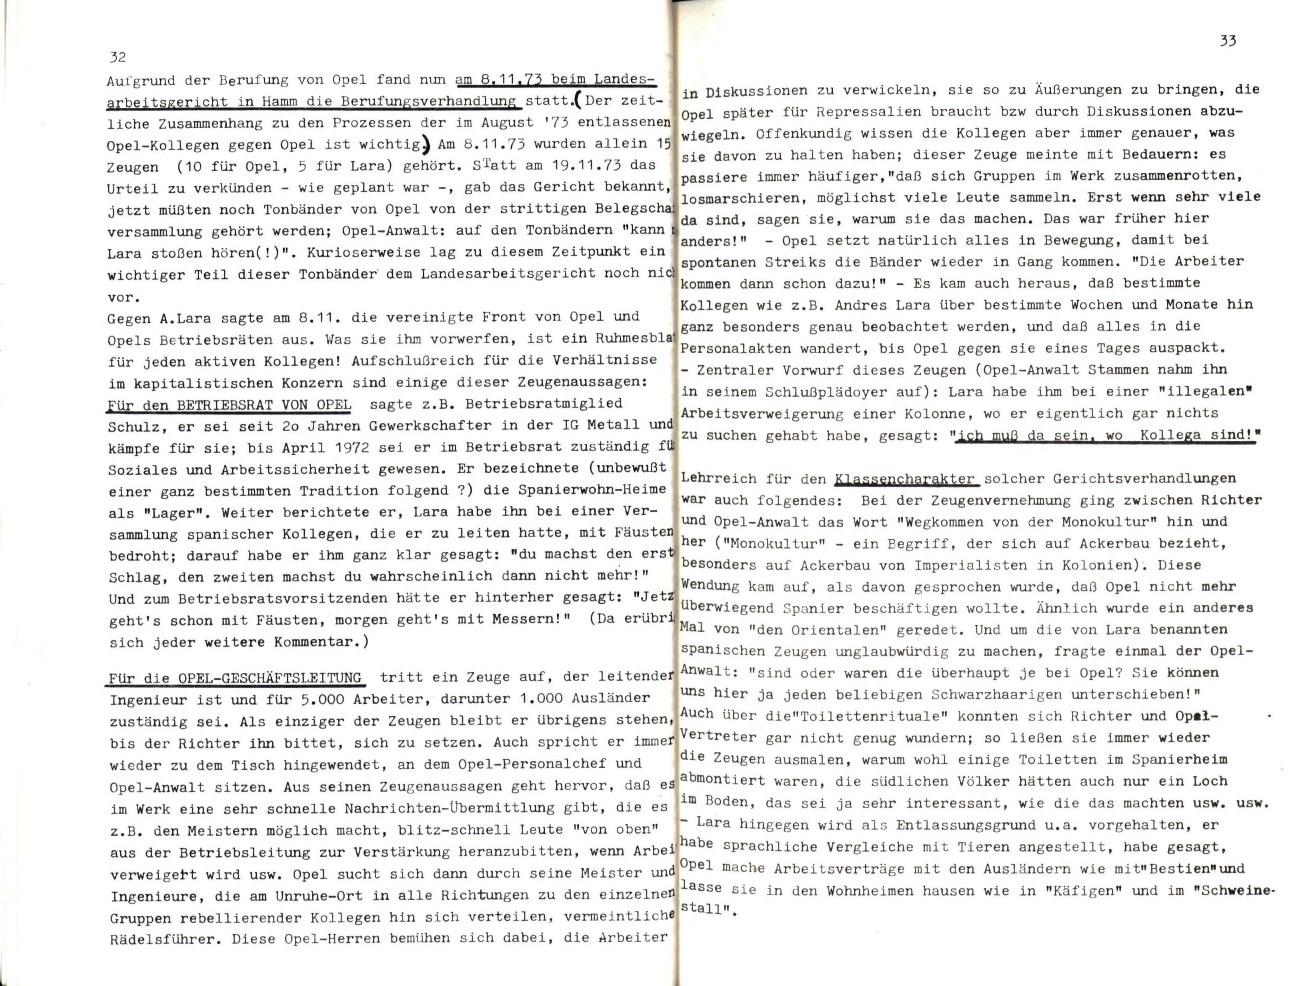 Bochum_IGM_Opel_PG_Opel_streikt_1973_018